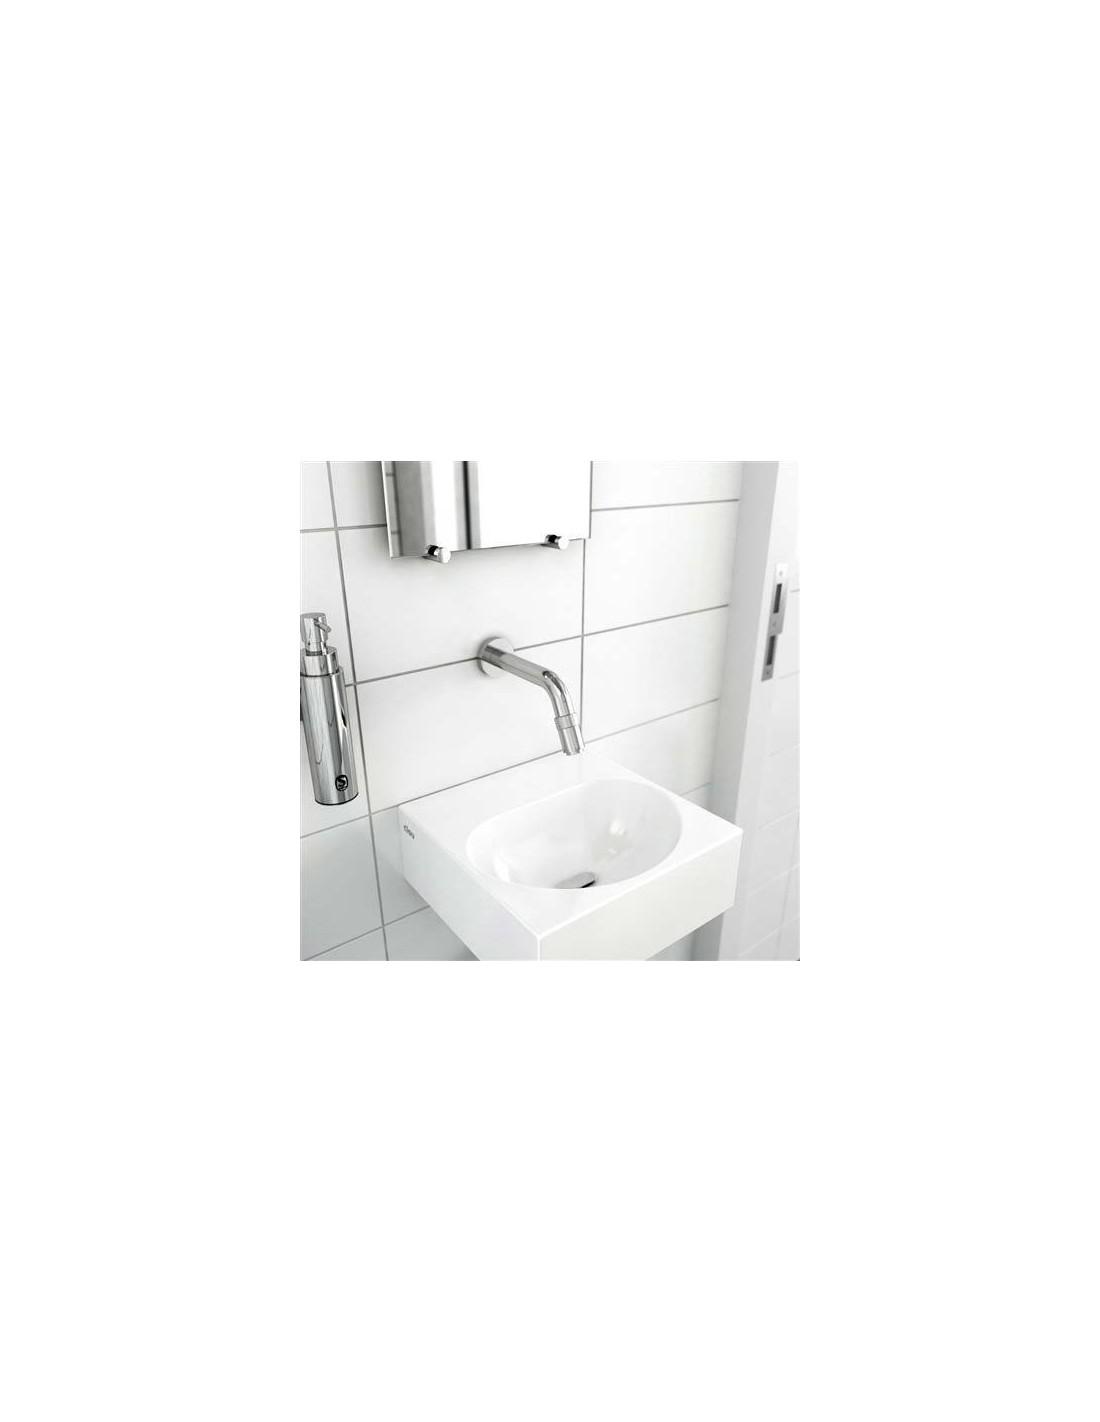 Robinet d 39 eau froide salle de bain for Robinet salle de bain design